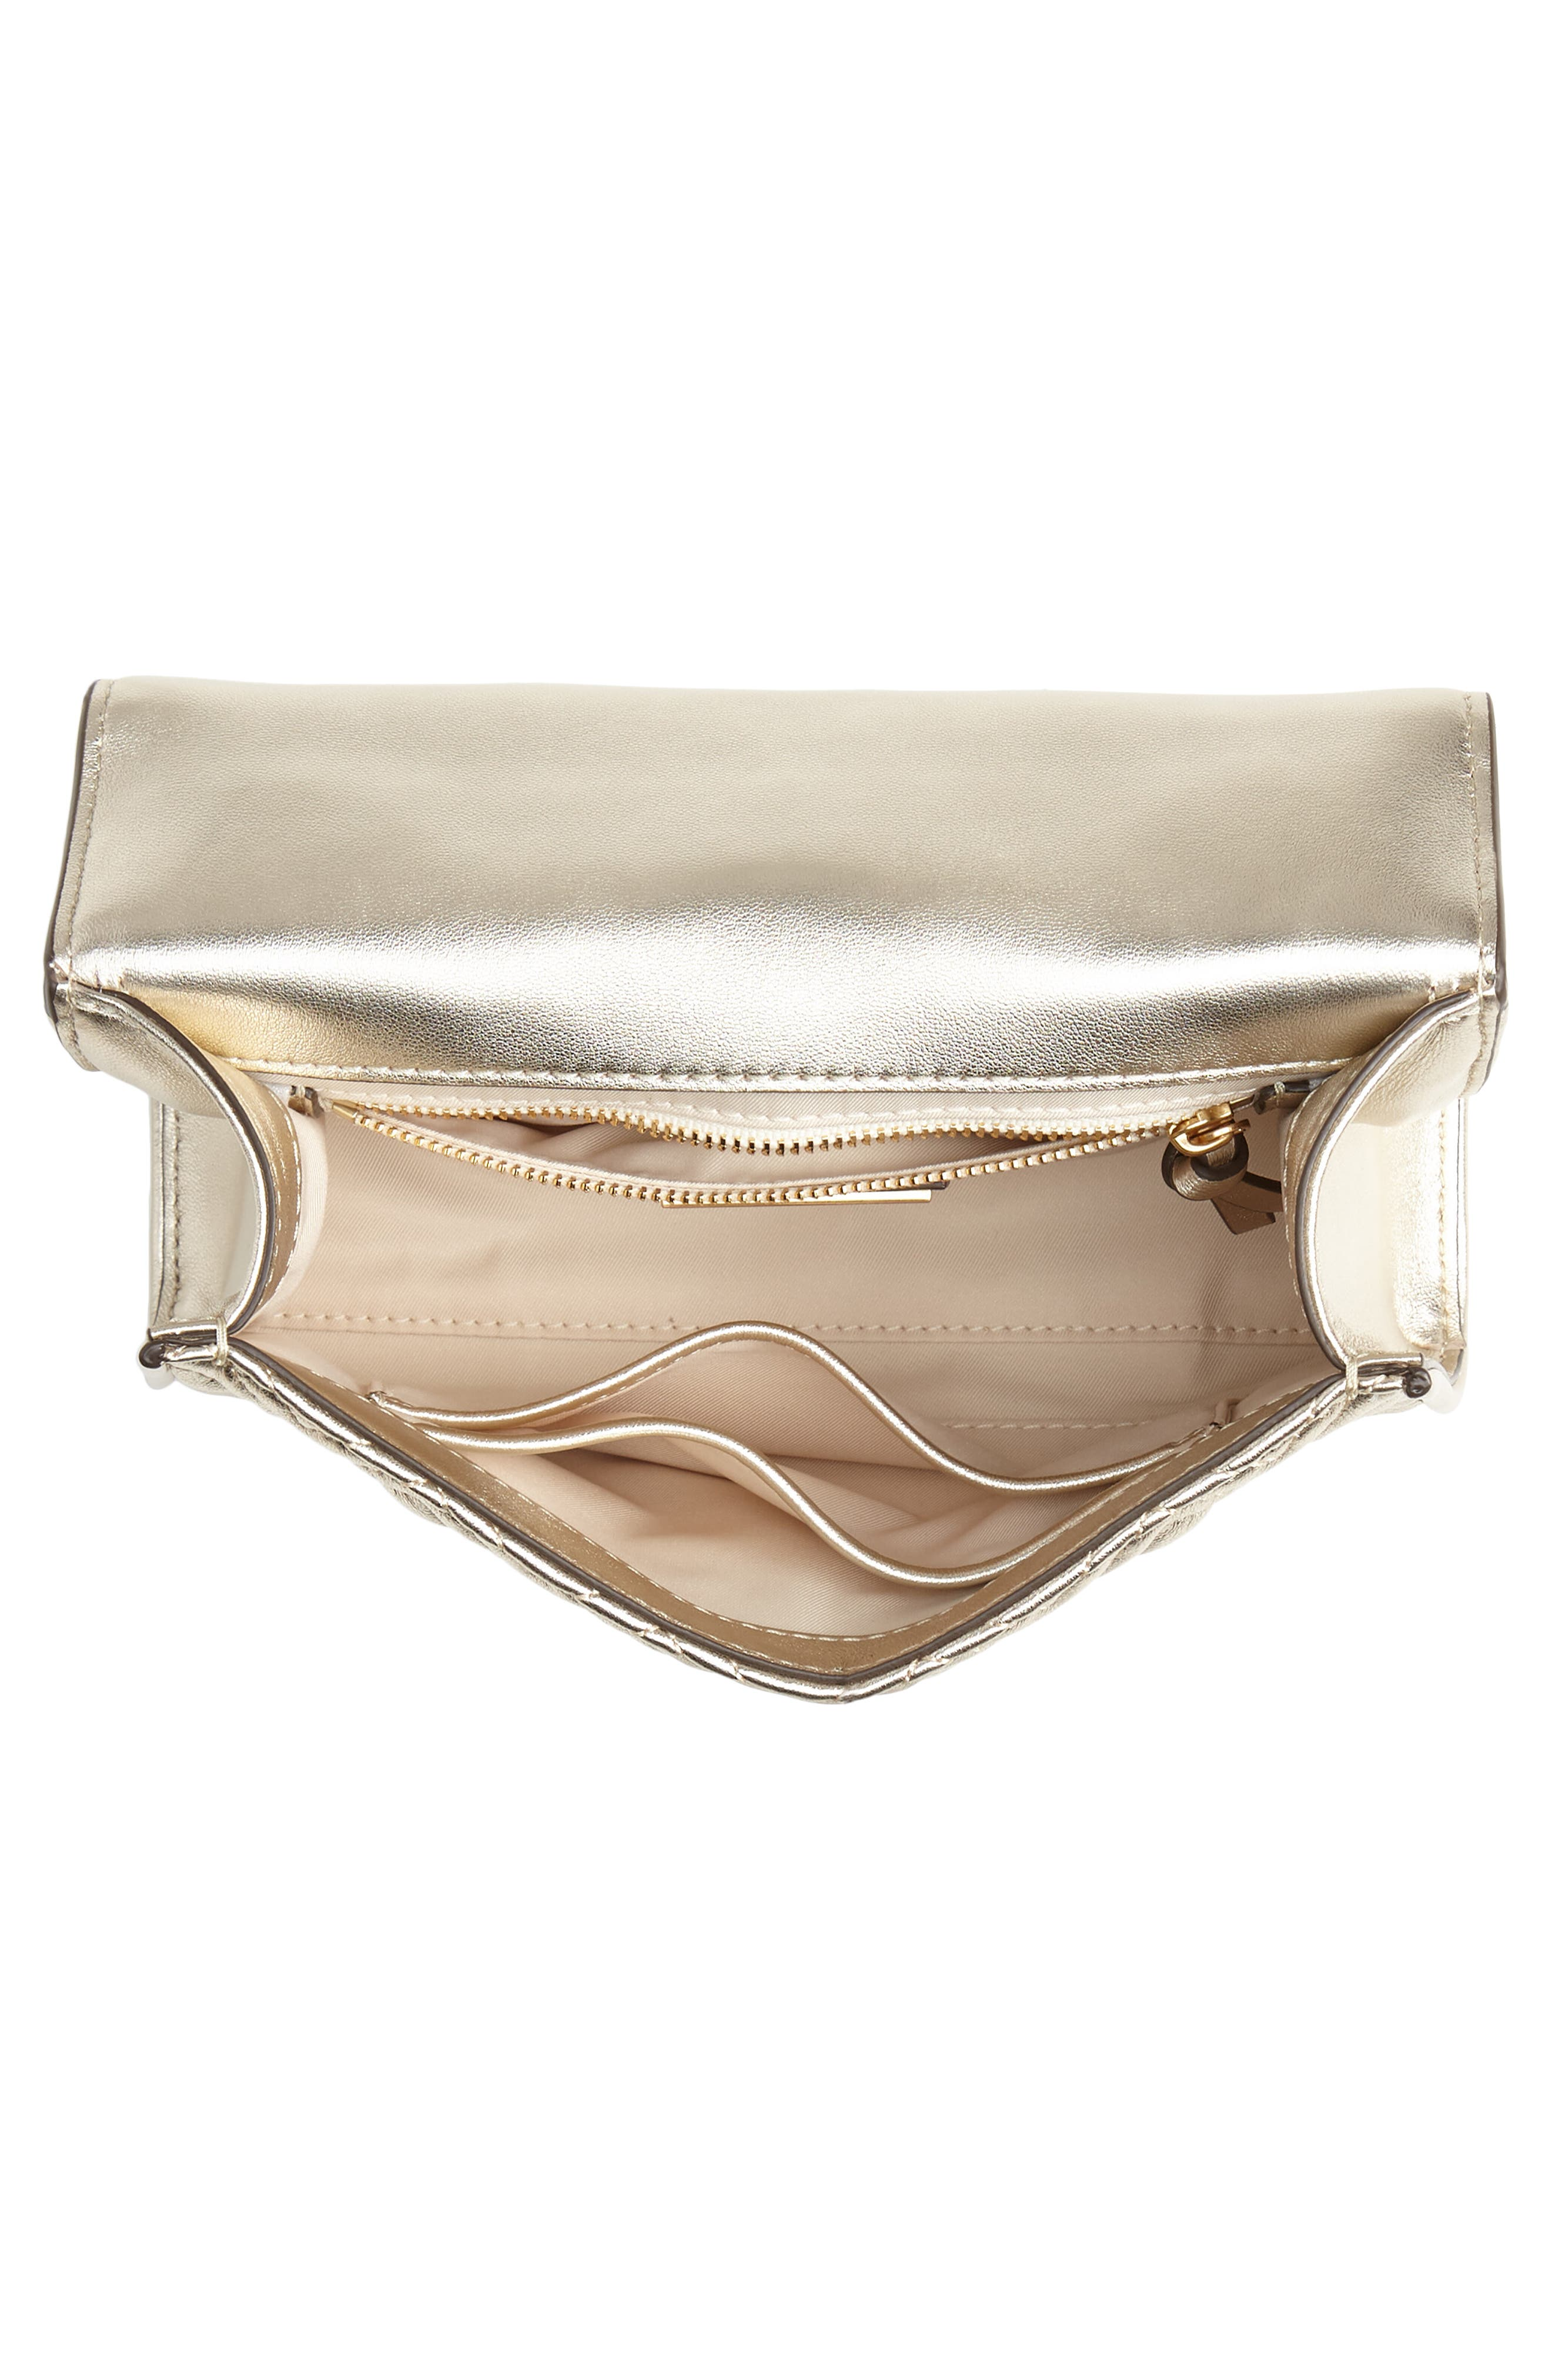 TORY BURCH,                             Small Fleming Metallic Lambskin Leather Convertible Shoulder Bag,                             Alternate thumbnail 4, color,                             100